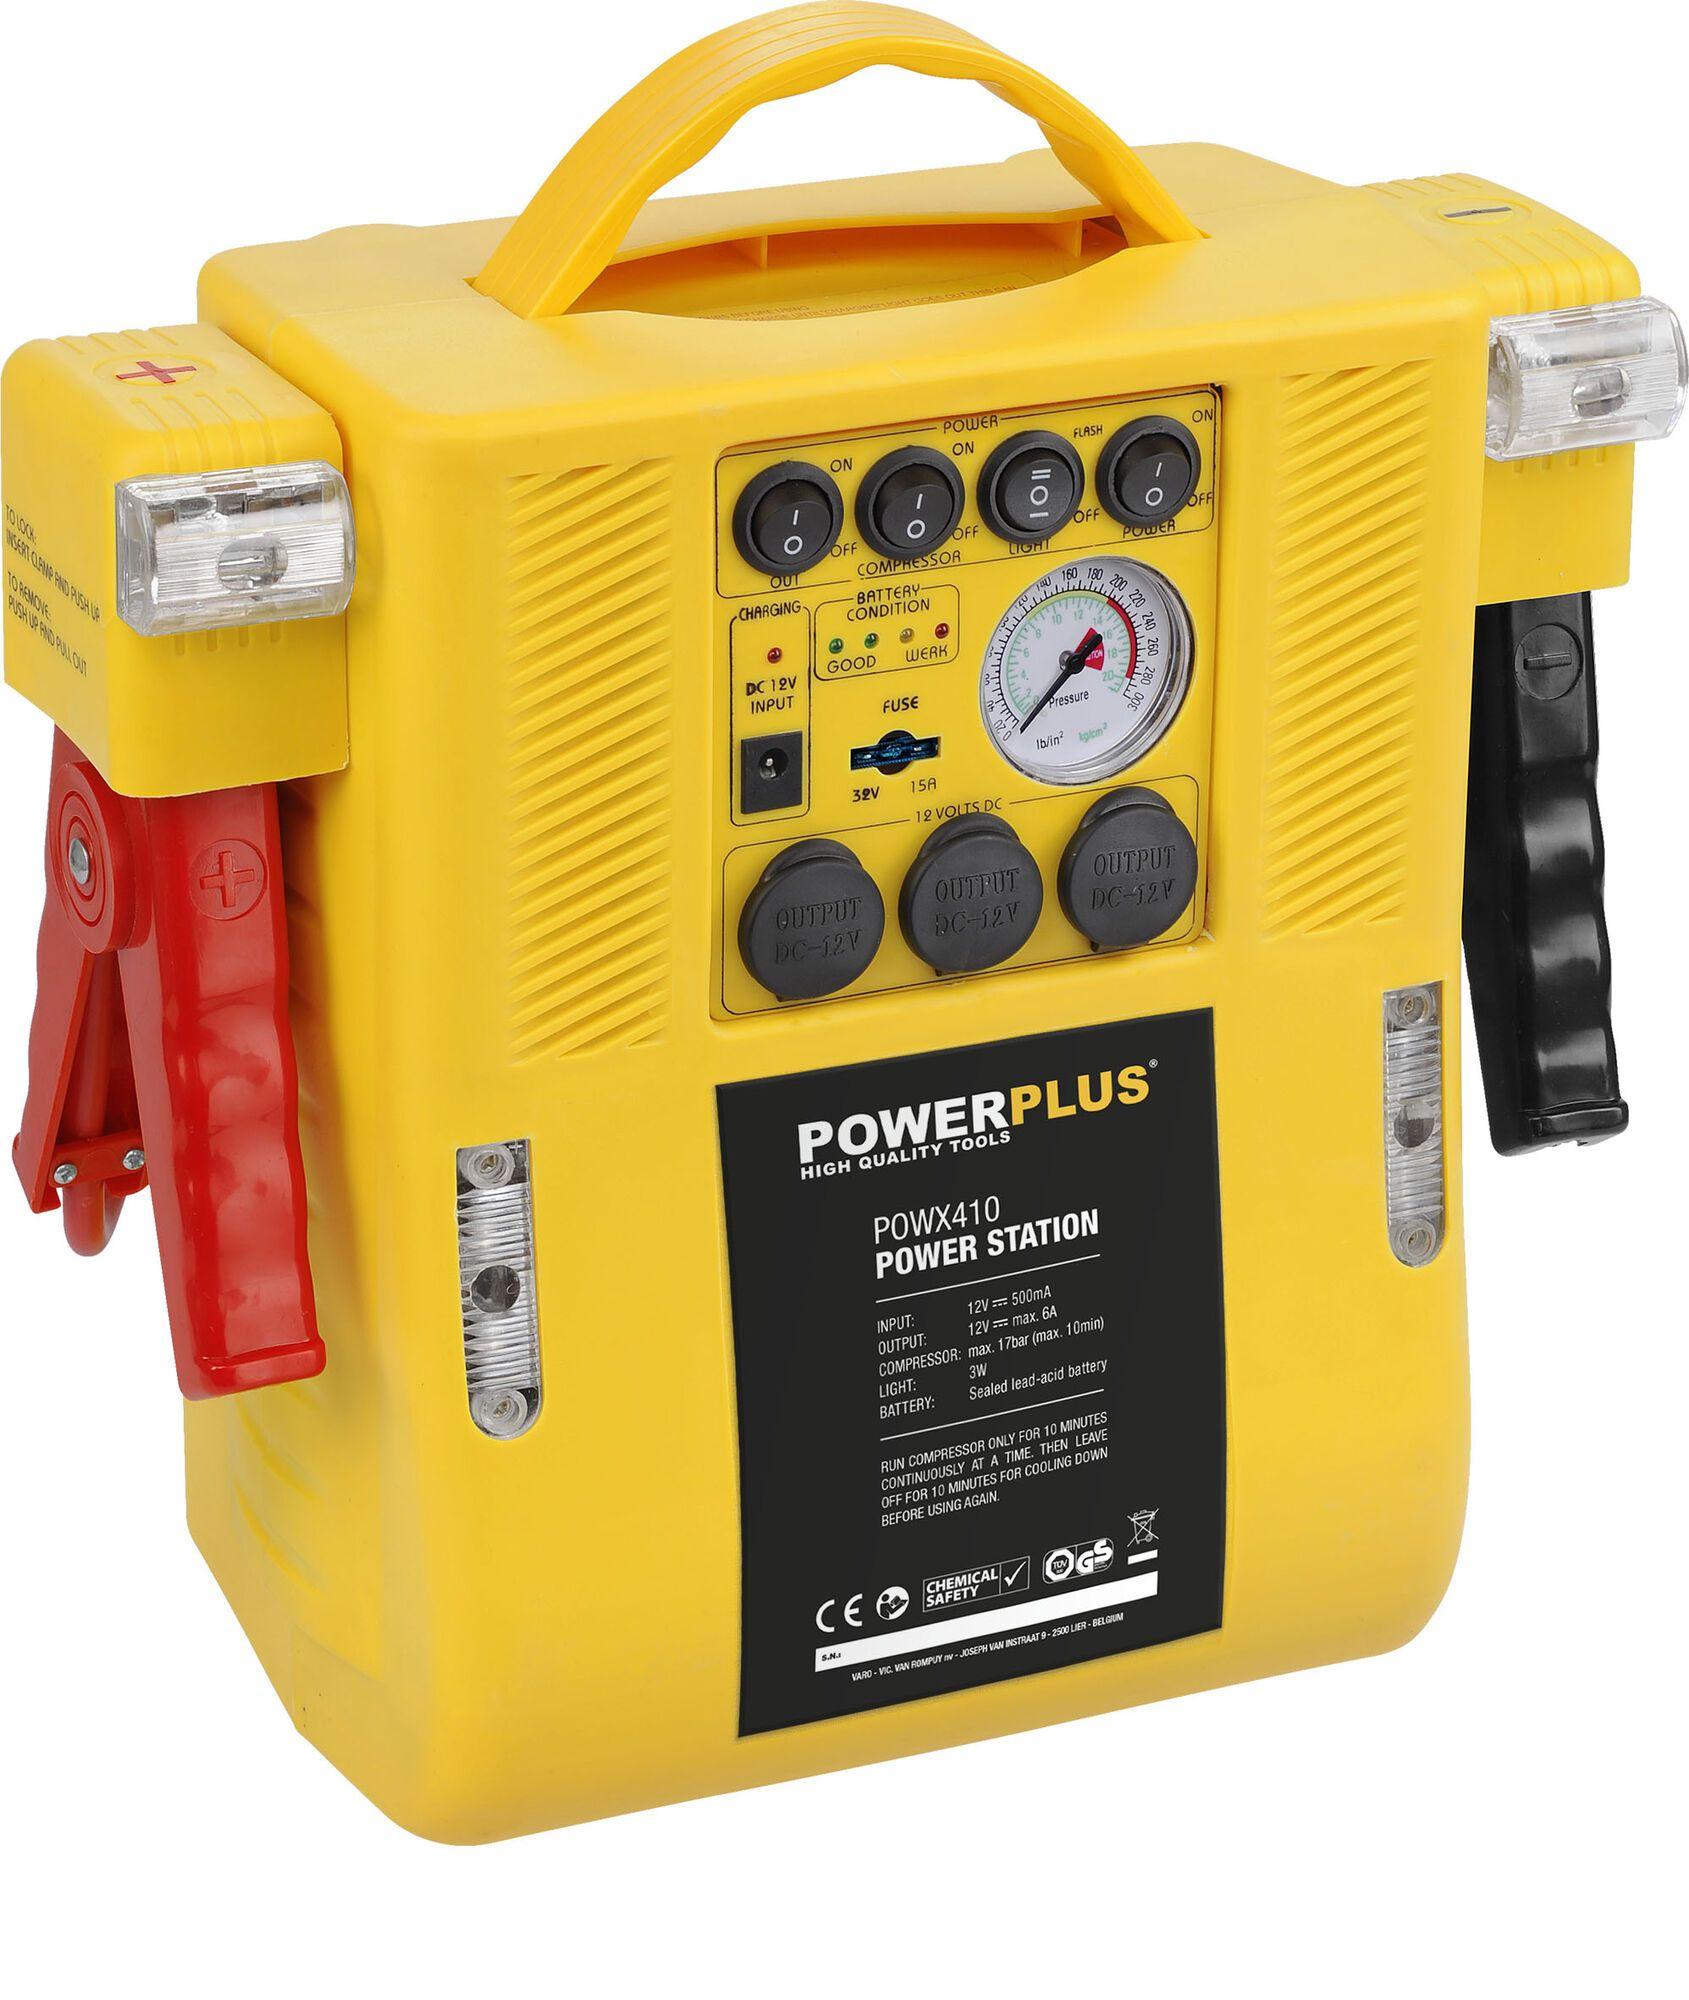 Powerplus POWX410 Energiestation   Compressor   Jumpstarter   Starthulp 4-in-1